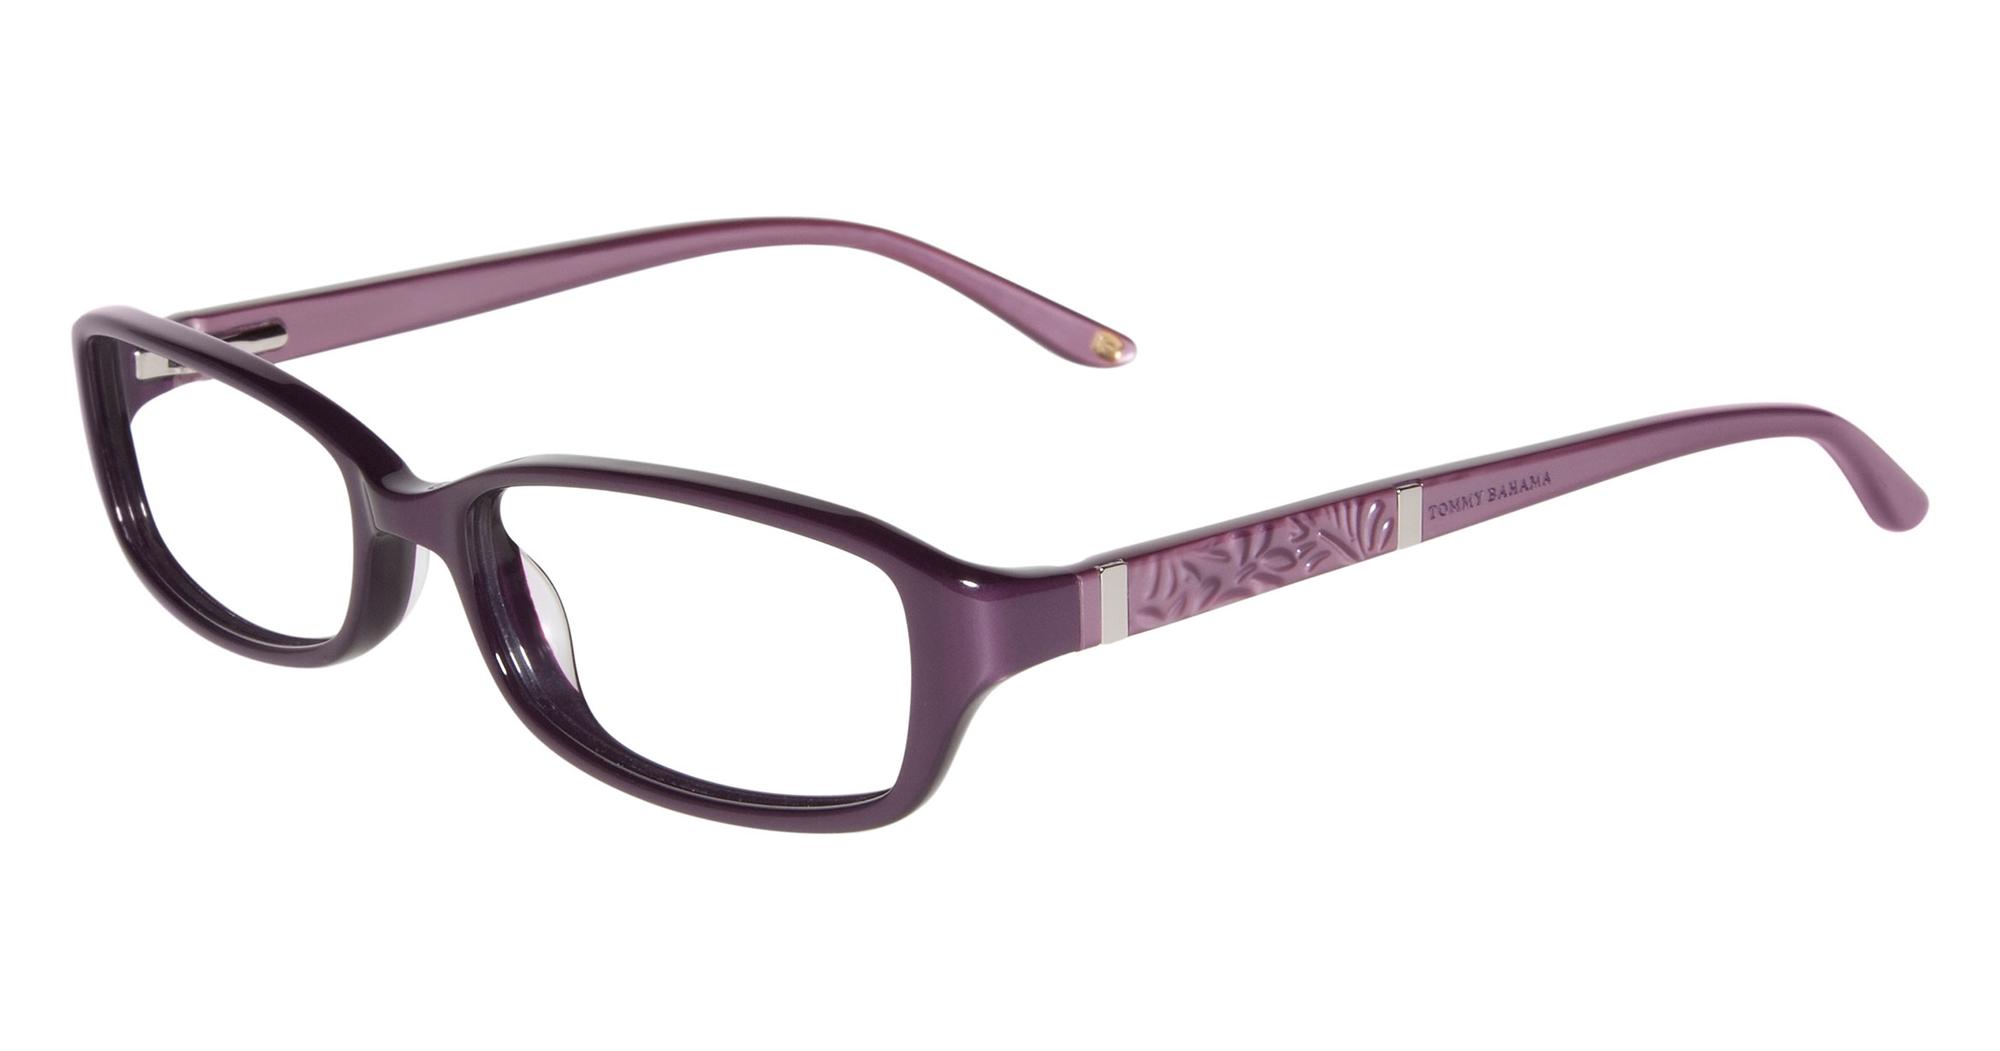 d66702b060 Ray Ban Eyeglasses Pearle Vision « Heritage Malta